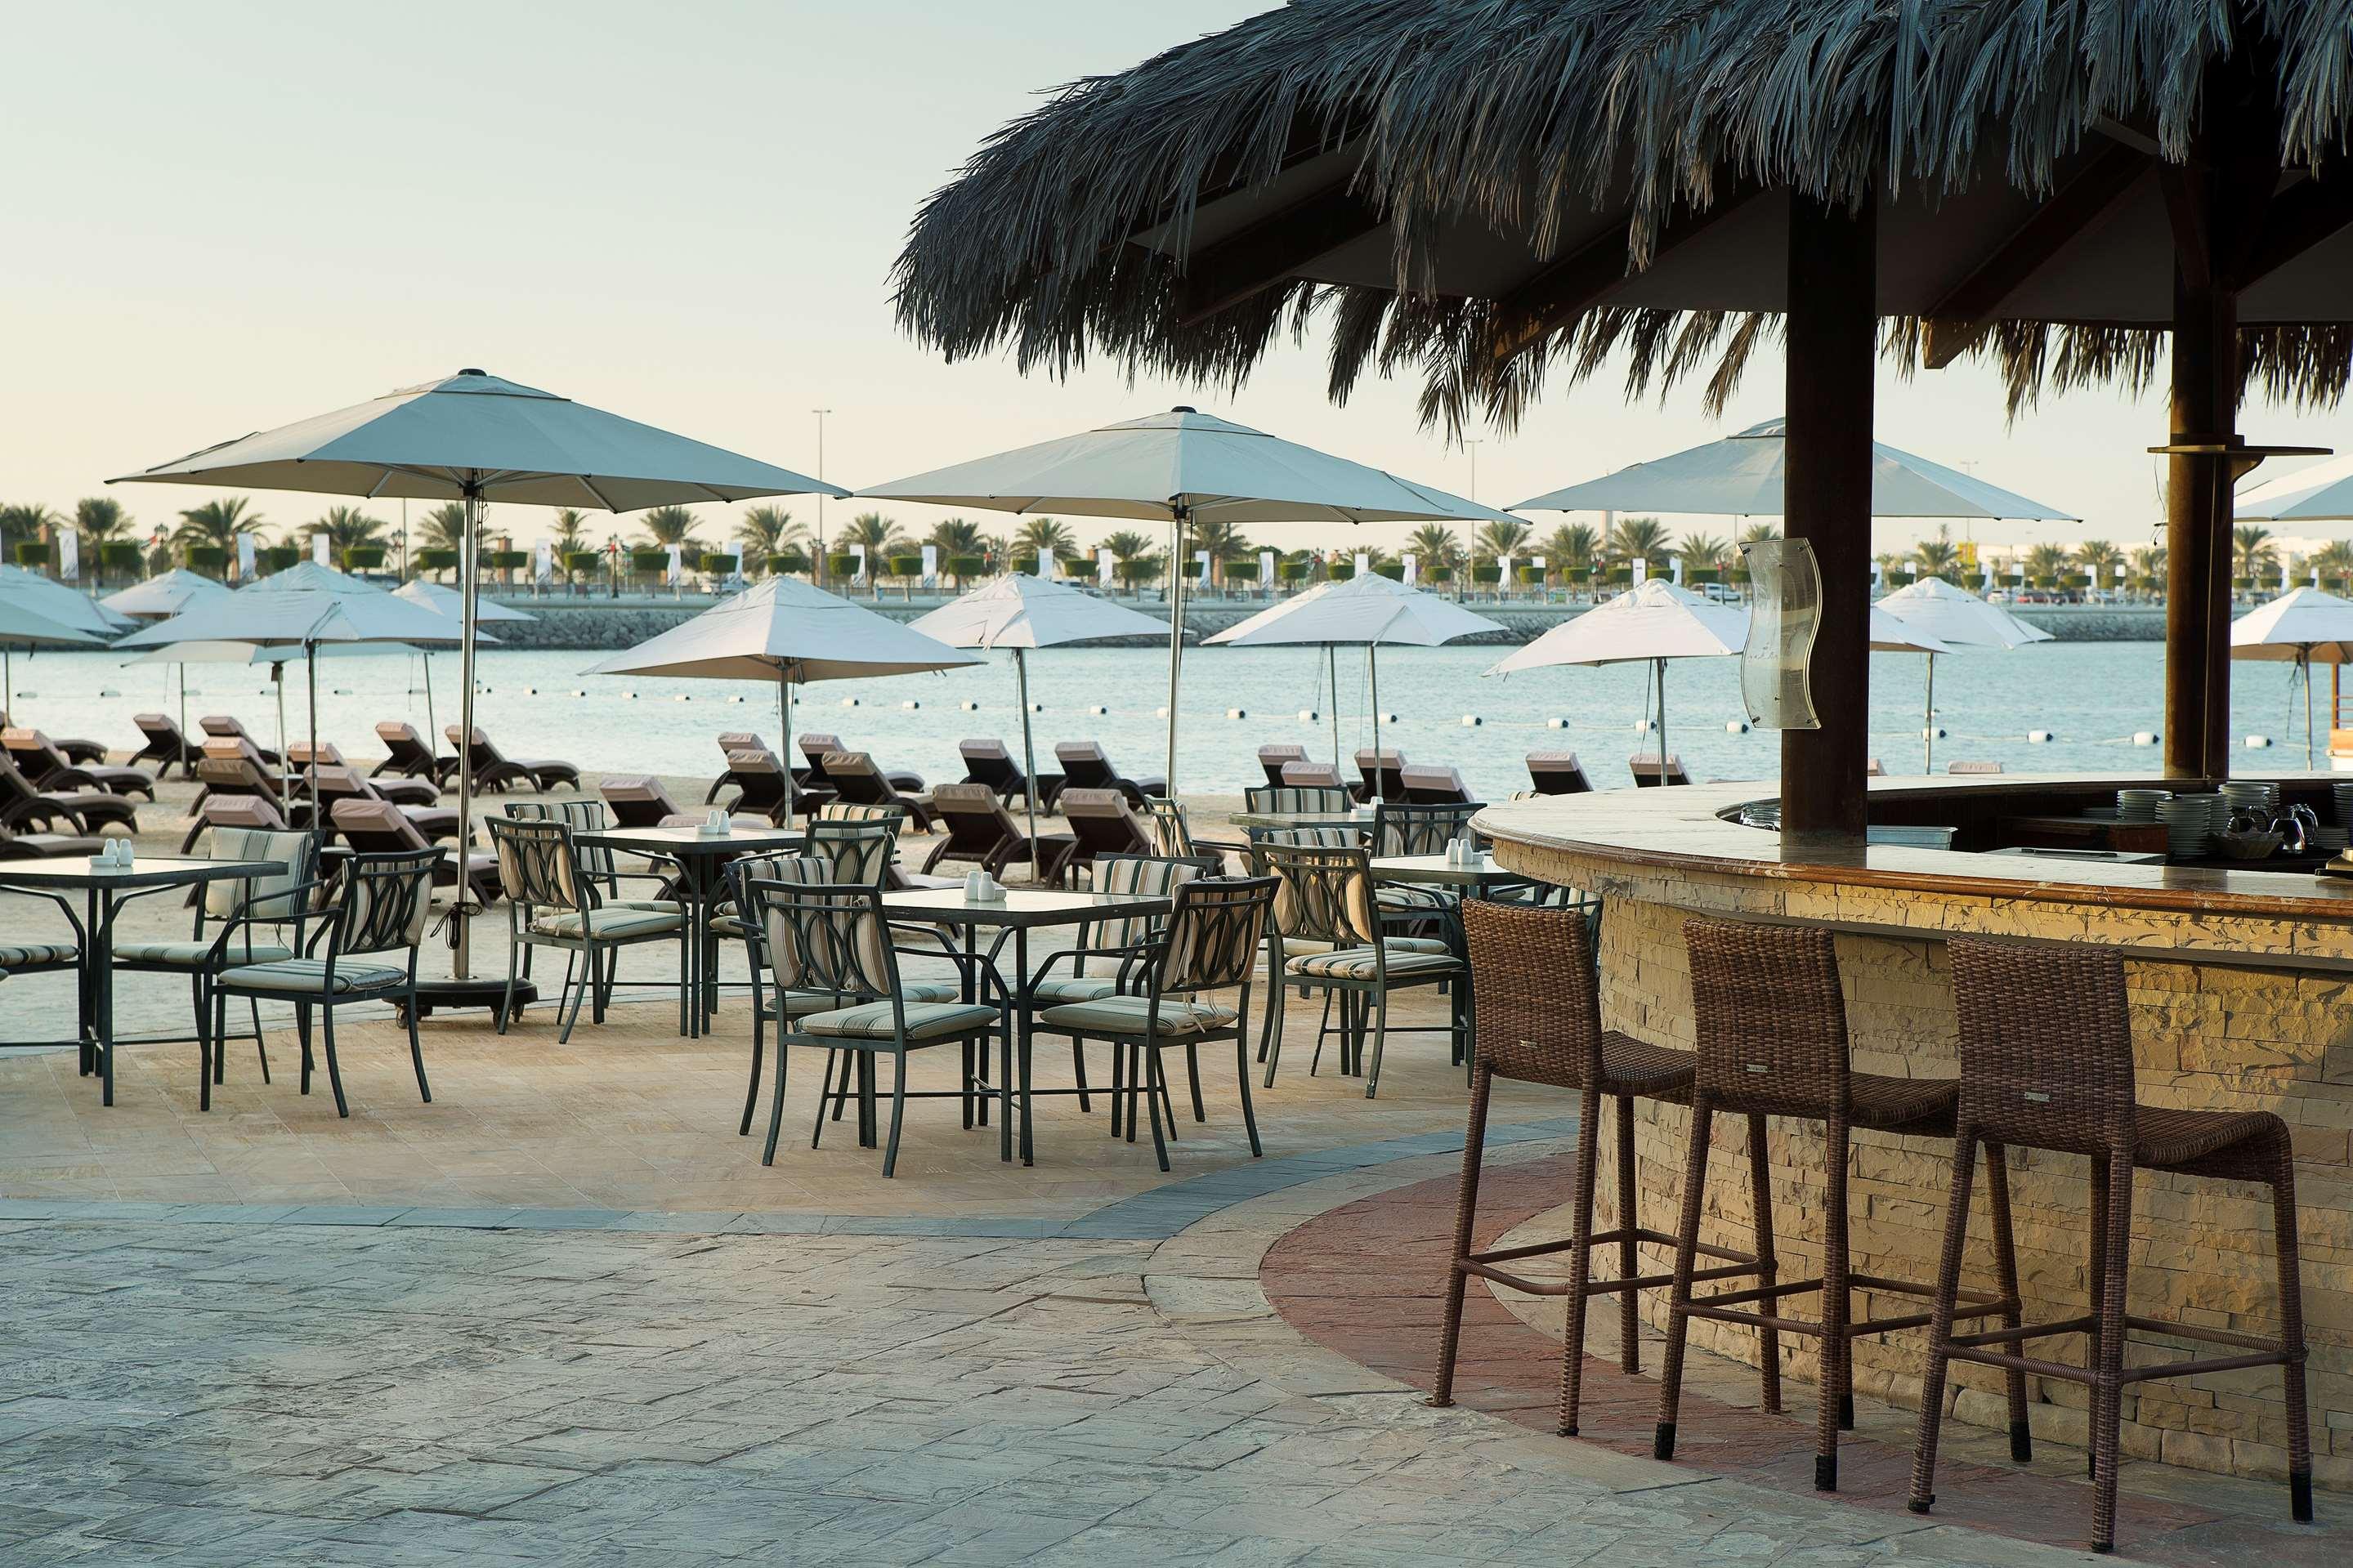 Hotel Corniche Abu Dhabi   Radisson Blu Hotel & Resort, Abu Dhabi Corniche